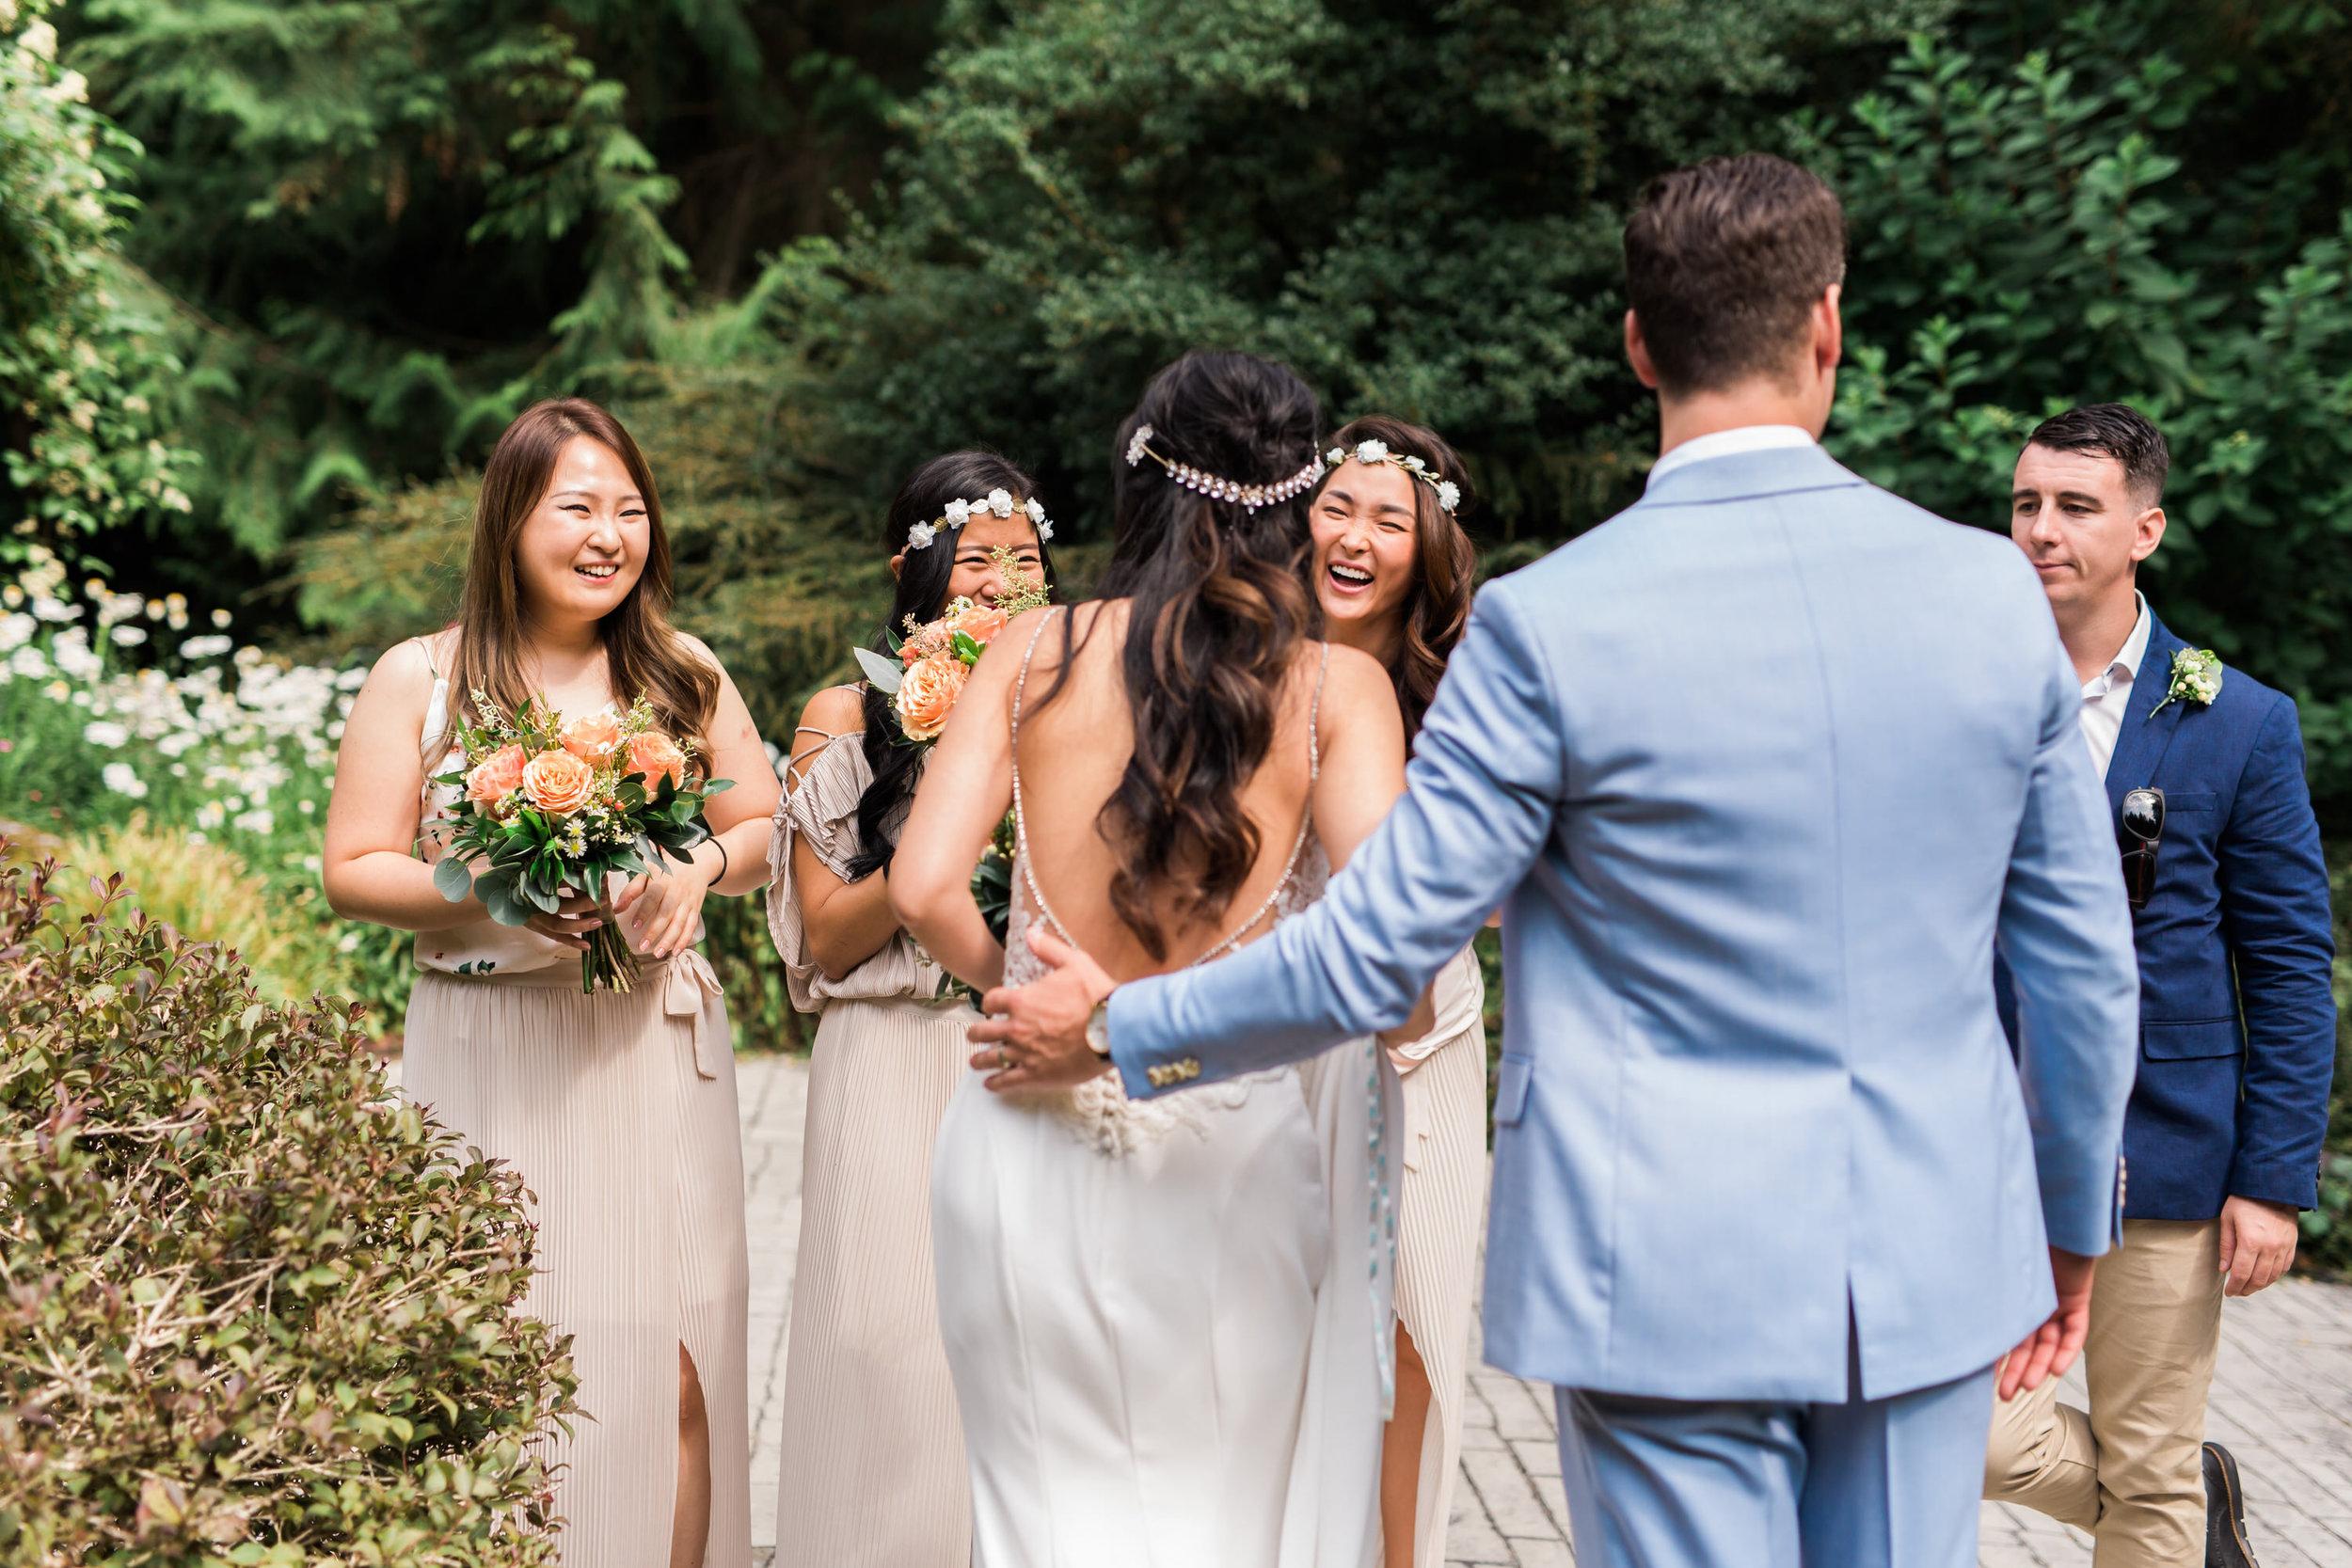 Linwood House Wedding Photos - Roberts Creek Wedding Photos - Vancouver Wedding Photographer & Videographer - Sunshine Coast Wedding Photos - Sunshine Coast Wedding Photographer - Jennifer Picard Photography - IMG_6615.jpg